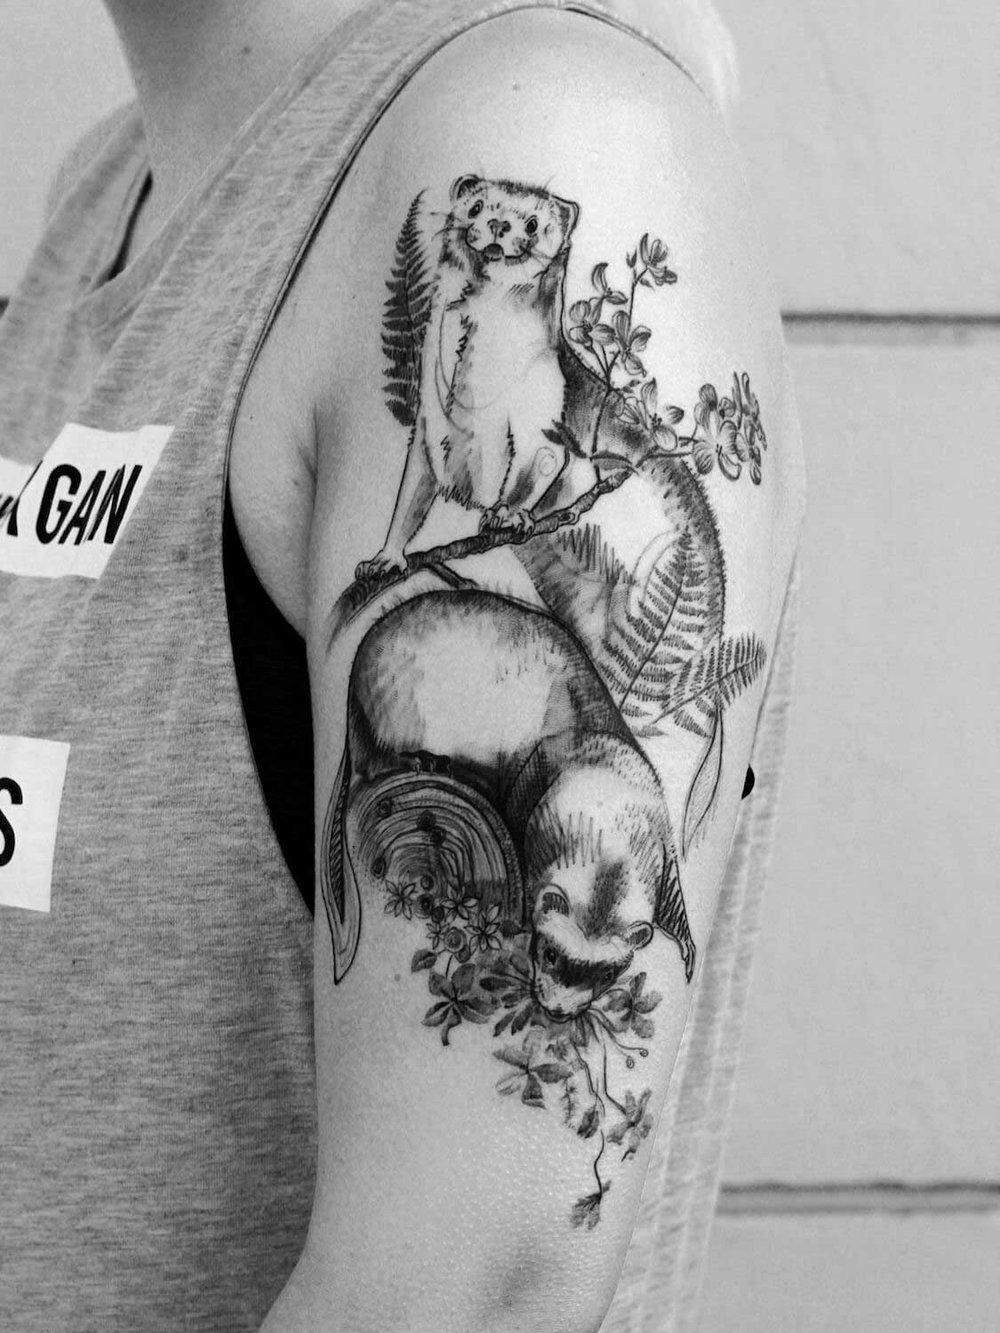 frettchen-sketchy-studio-velbert-langenberg-madlyne-van-looy-tattoo-art.jpg